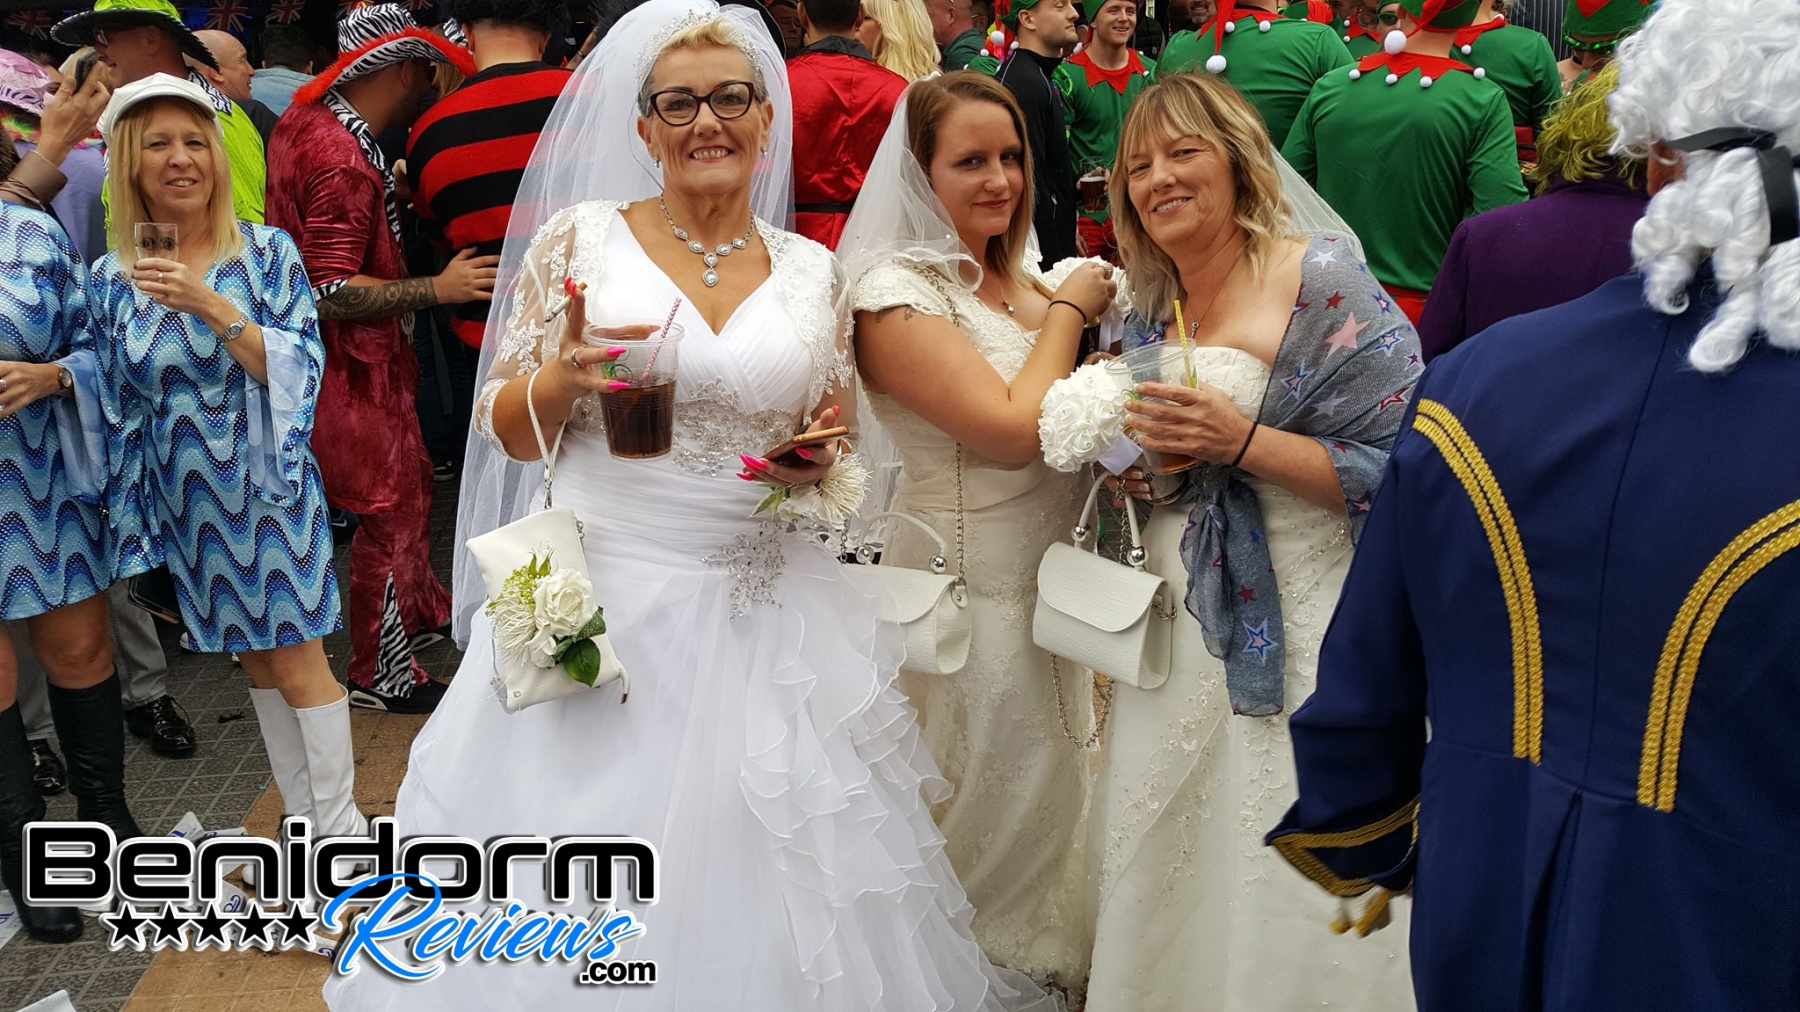 Benidorm-Fiestas-2019-Fancy-Dress-51